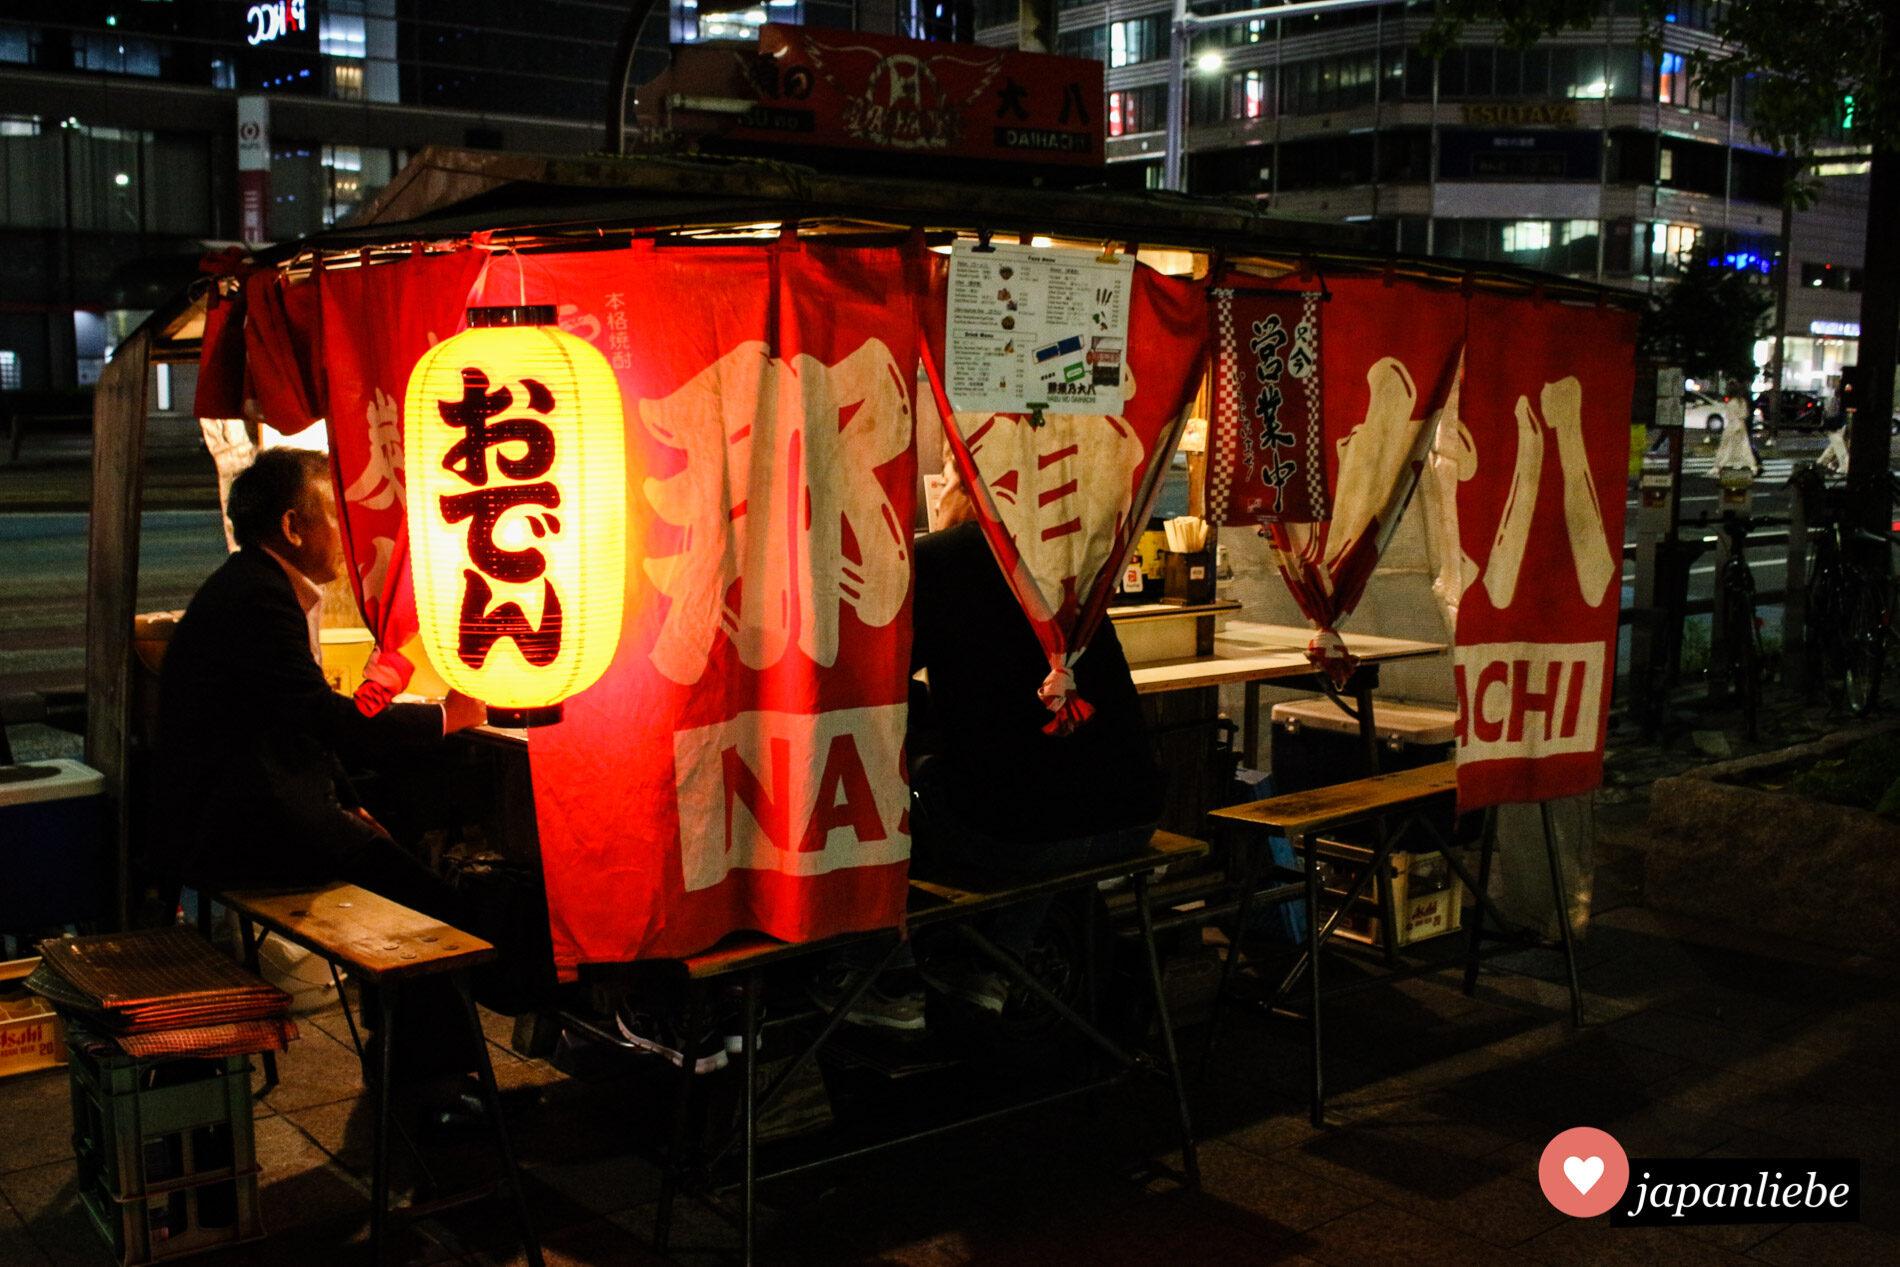 Ein yatai-Imbiss in Fukuoka verkauft nachts Oden, ein japanisches Eintopfgericht.